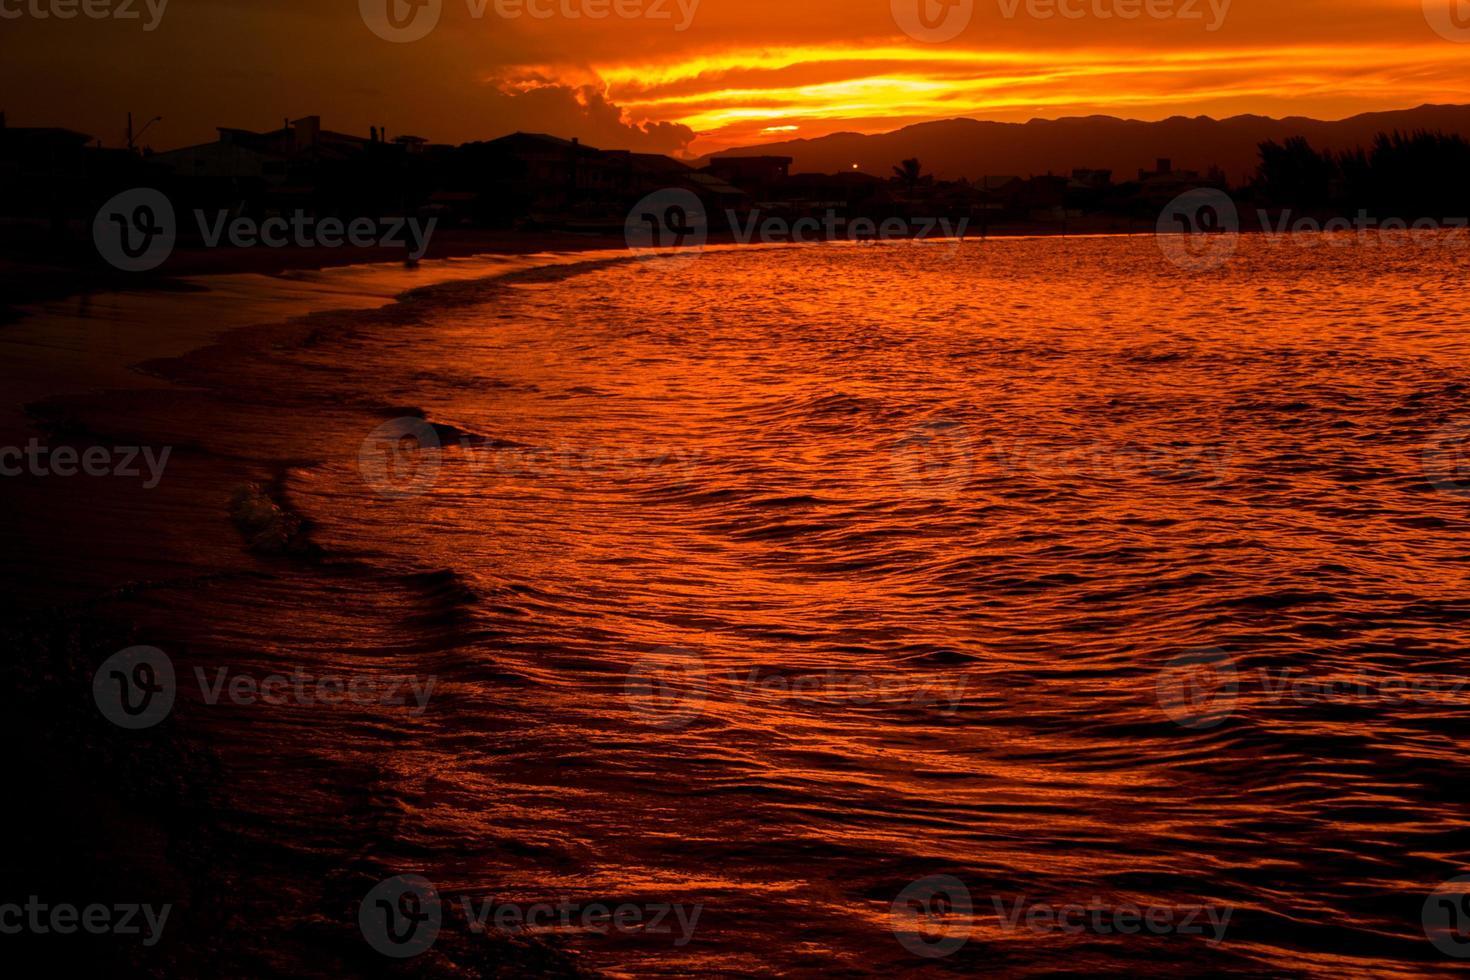 schöner Sonnenuntergangsstrand in Südbrasilien foto